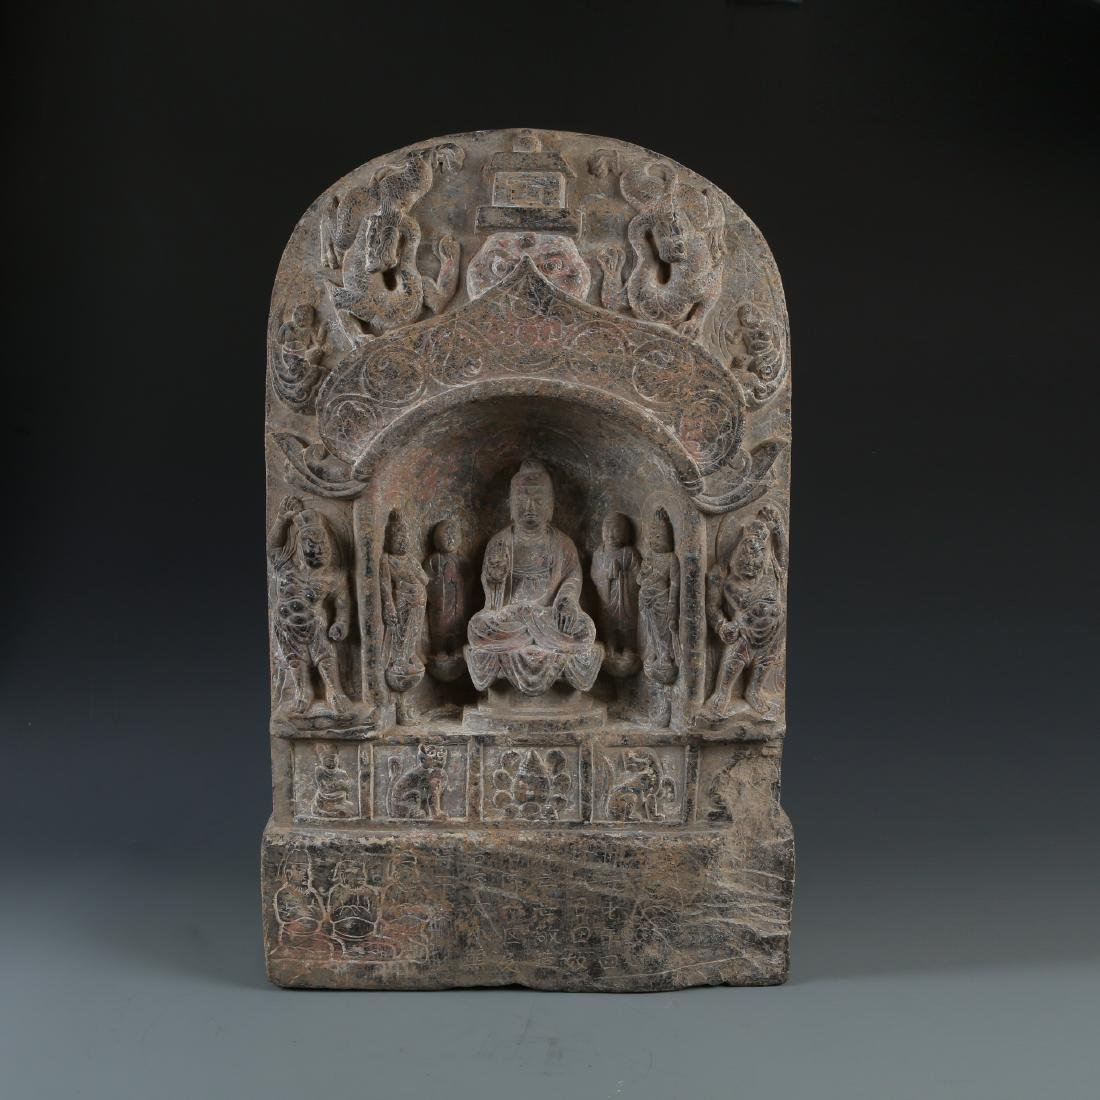 Carved Stone Stele of Buddha